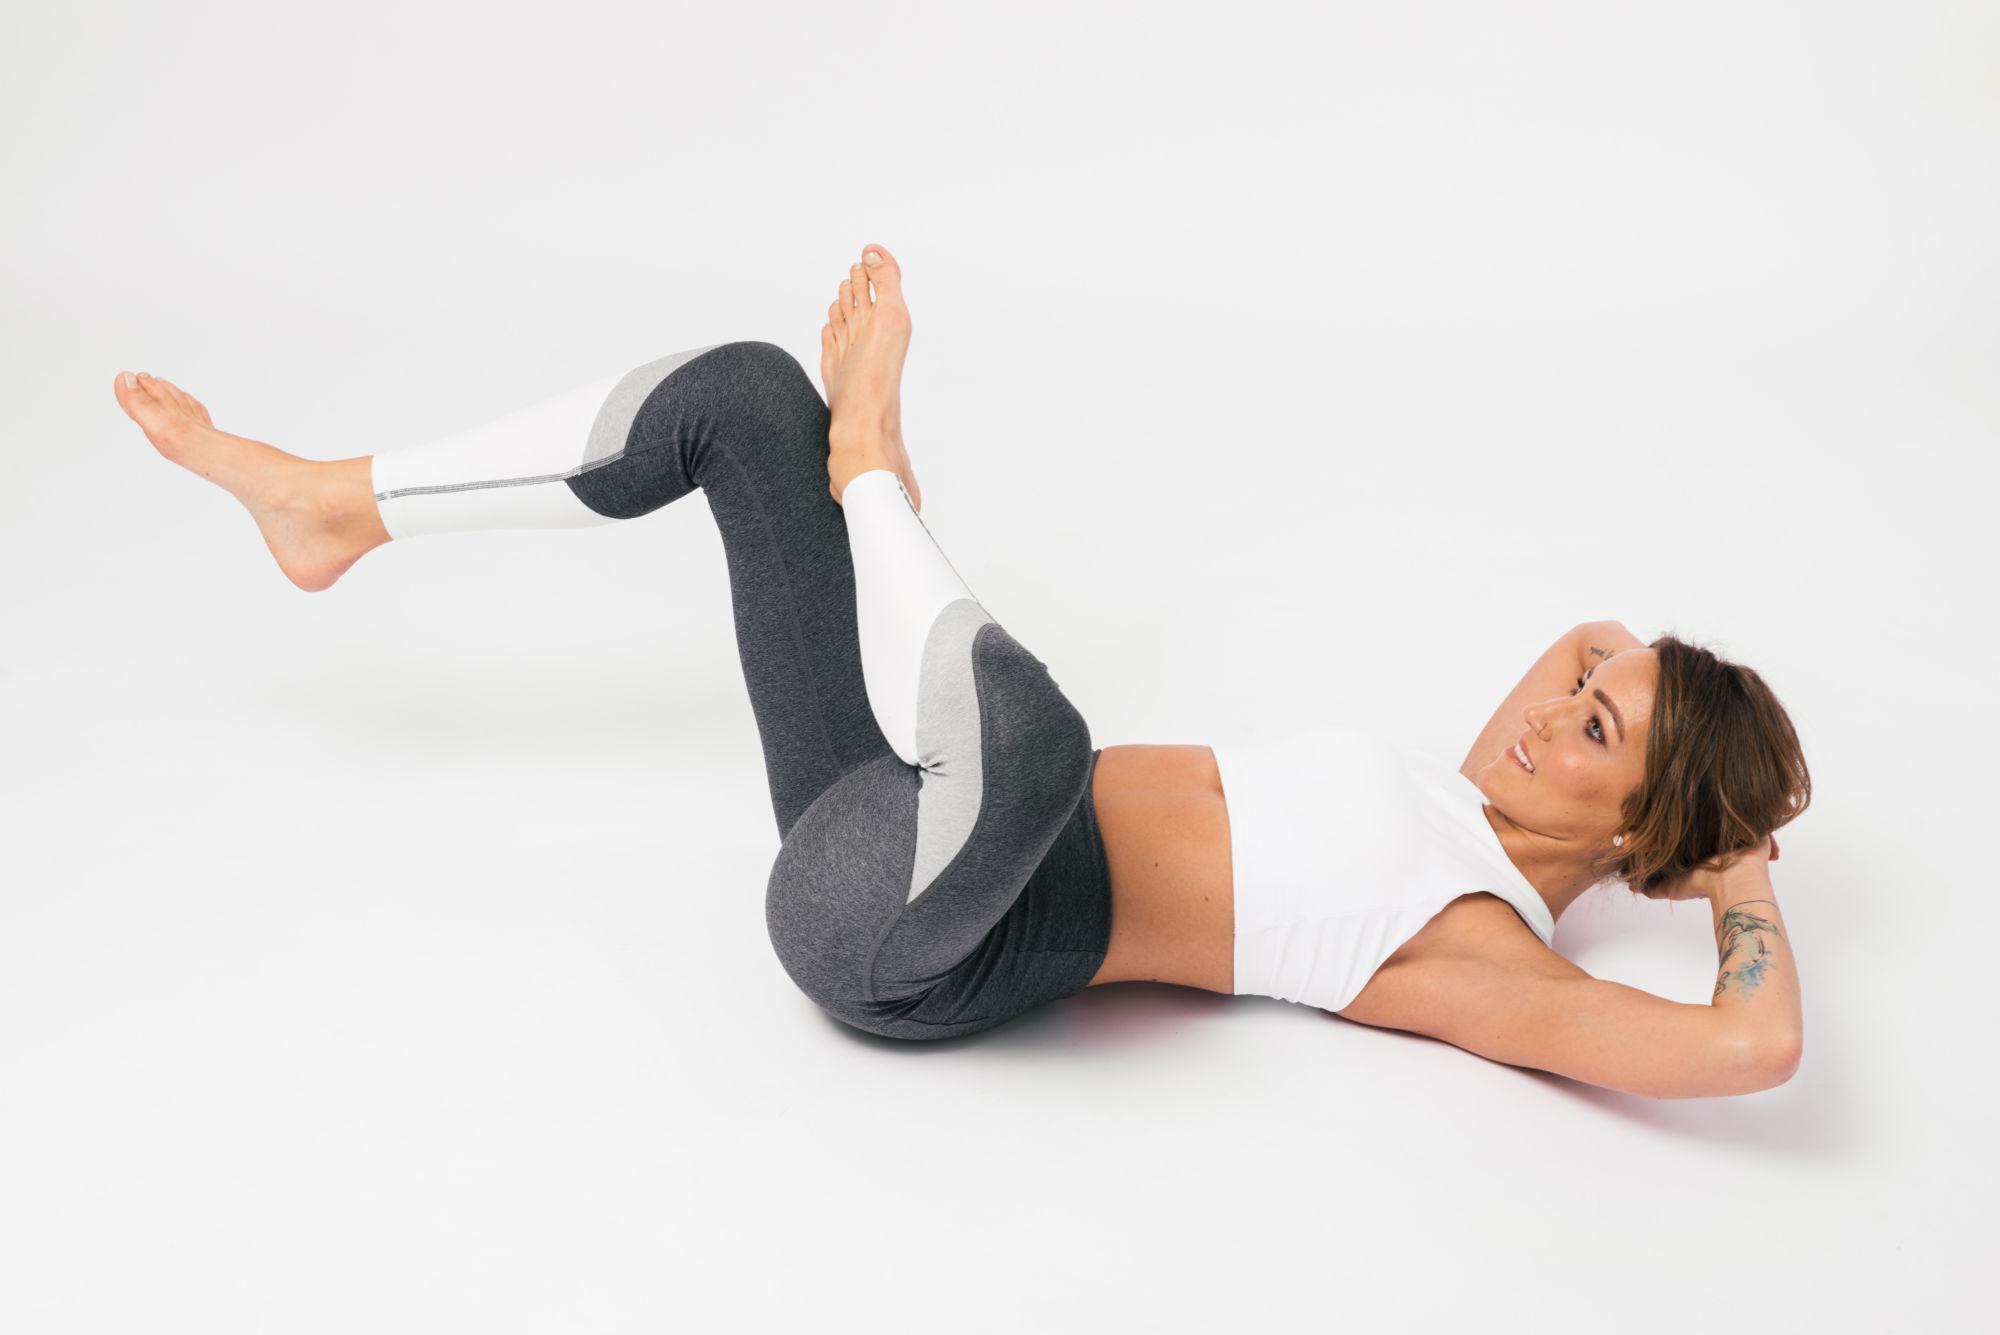 FitPainFree-cviceni-exercise-fitness-egoscue-method-education-akreditovane-skoleni-vzdelavani-ceskarepublika-praha-brno-bezbolesti-nopain-jendoduche-izolovane-cviceni-hana-toufarova-lektor-rehabilitace-fyzioterapie